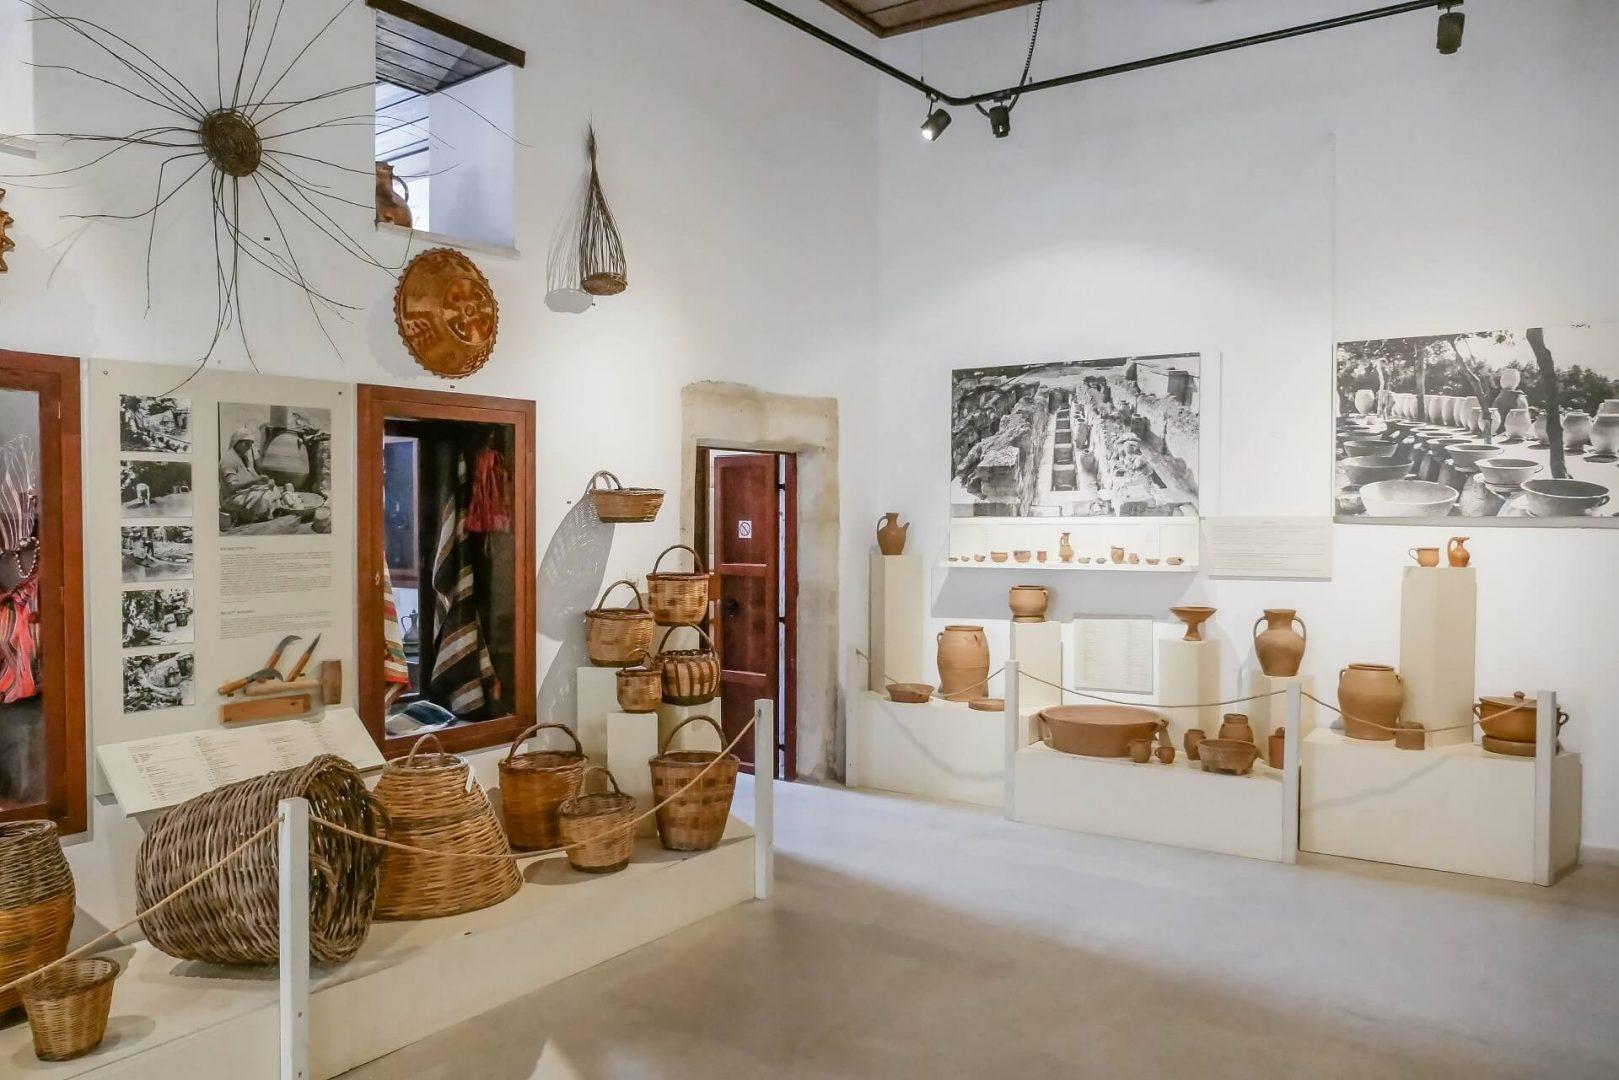 History and Folk Art Museum, Rethymno, Greece